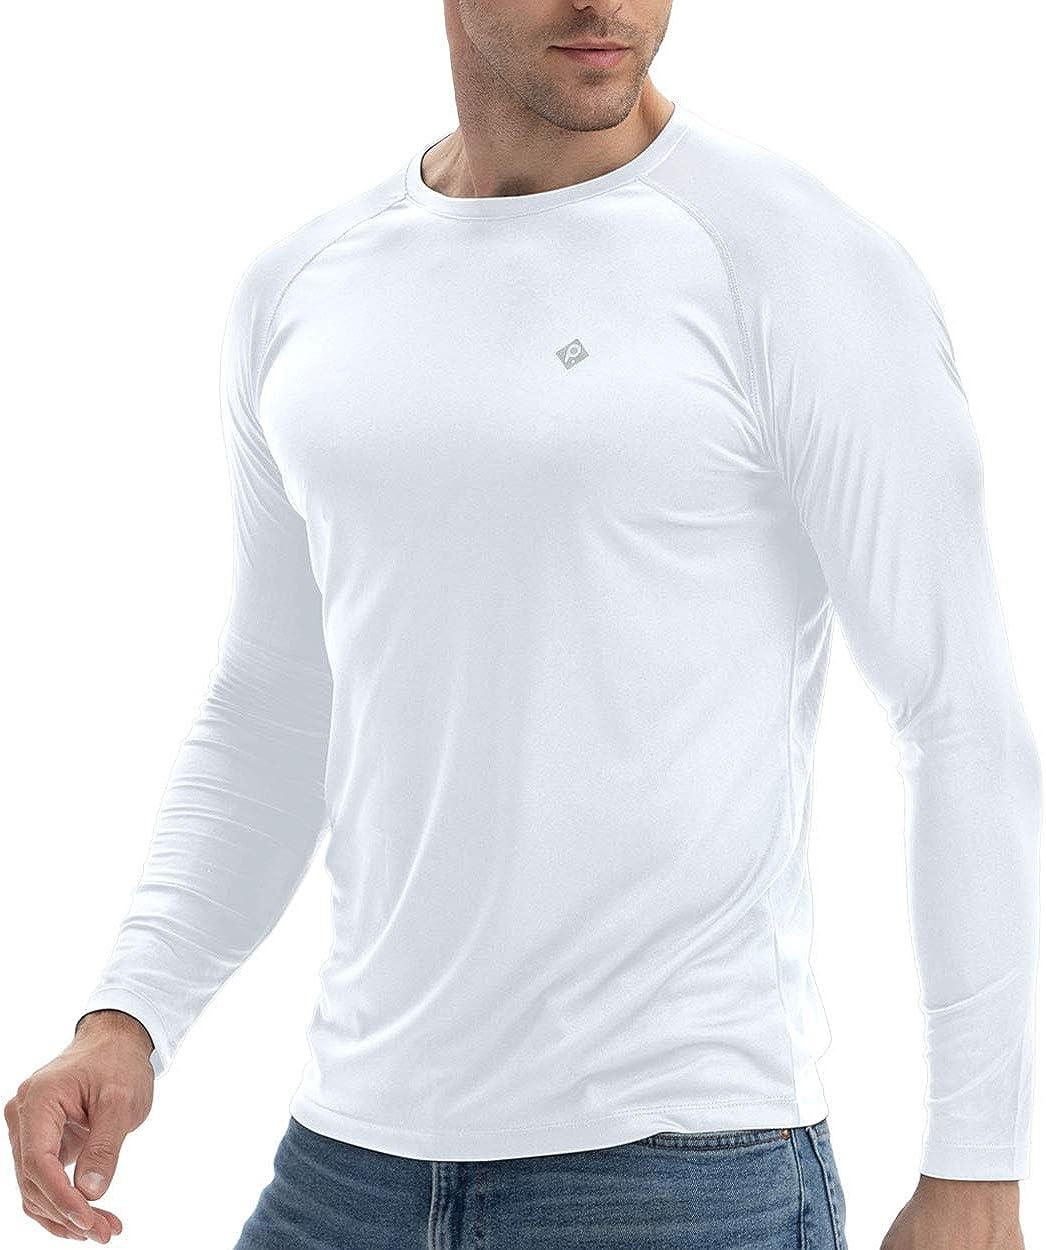 RlaGed Men's UPF 50+ UV Sun Protection Running Shirts Long Sleeve Quick Dry Sports Hiking Fishing Shirts for Men